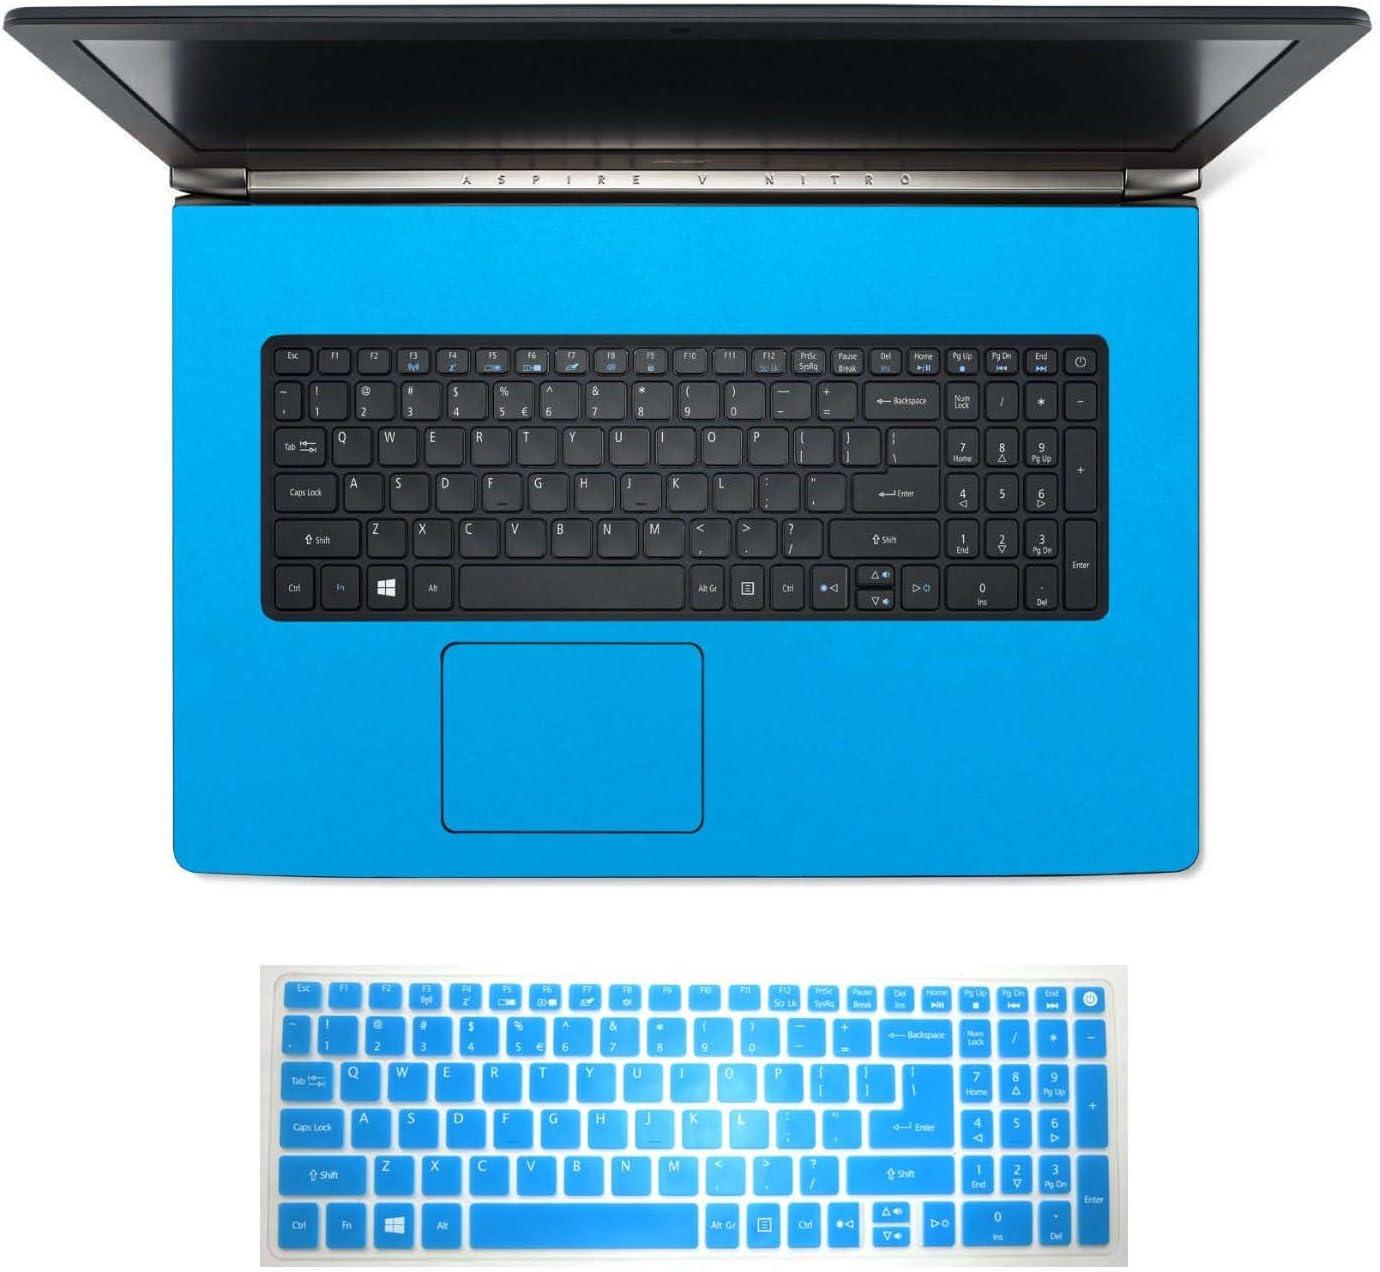 2in1 Wrist Palmrest Skin Sticker With Touchpad Cover+ Keyboard Protector for Acer Aspire Nitro VN7-792, VN7-792G (shimmery light blue palmrest sticker+semi-blue keyboard skin)